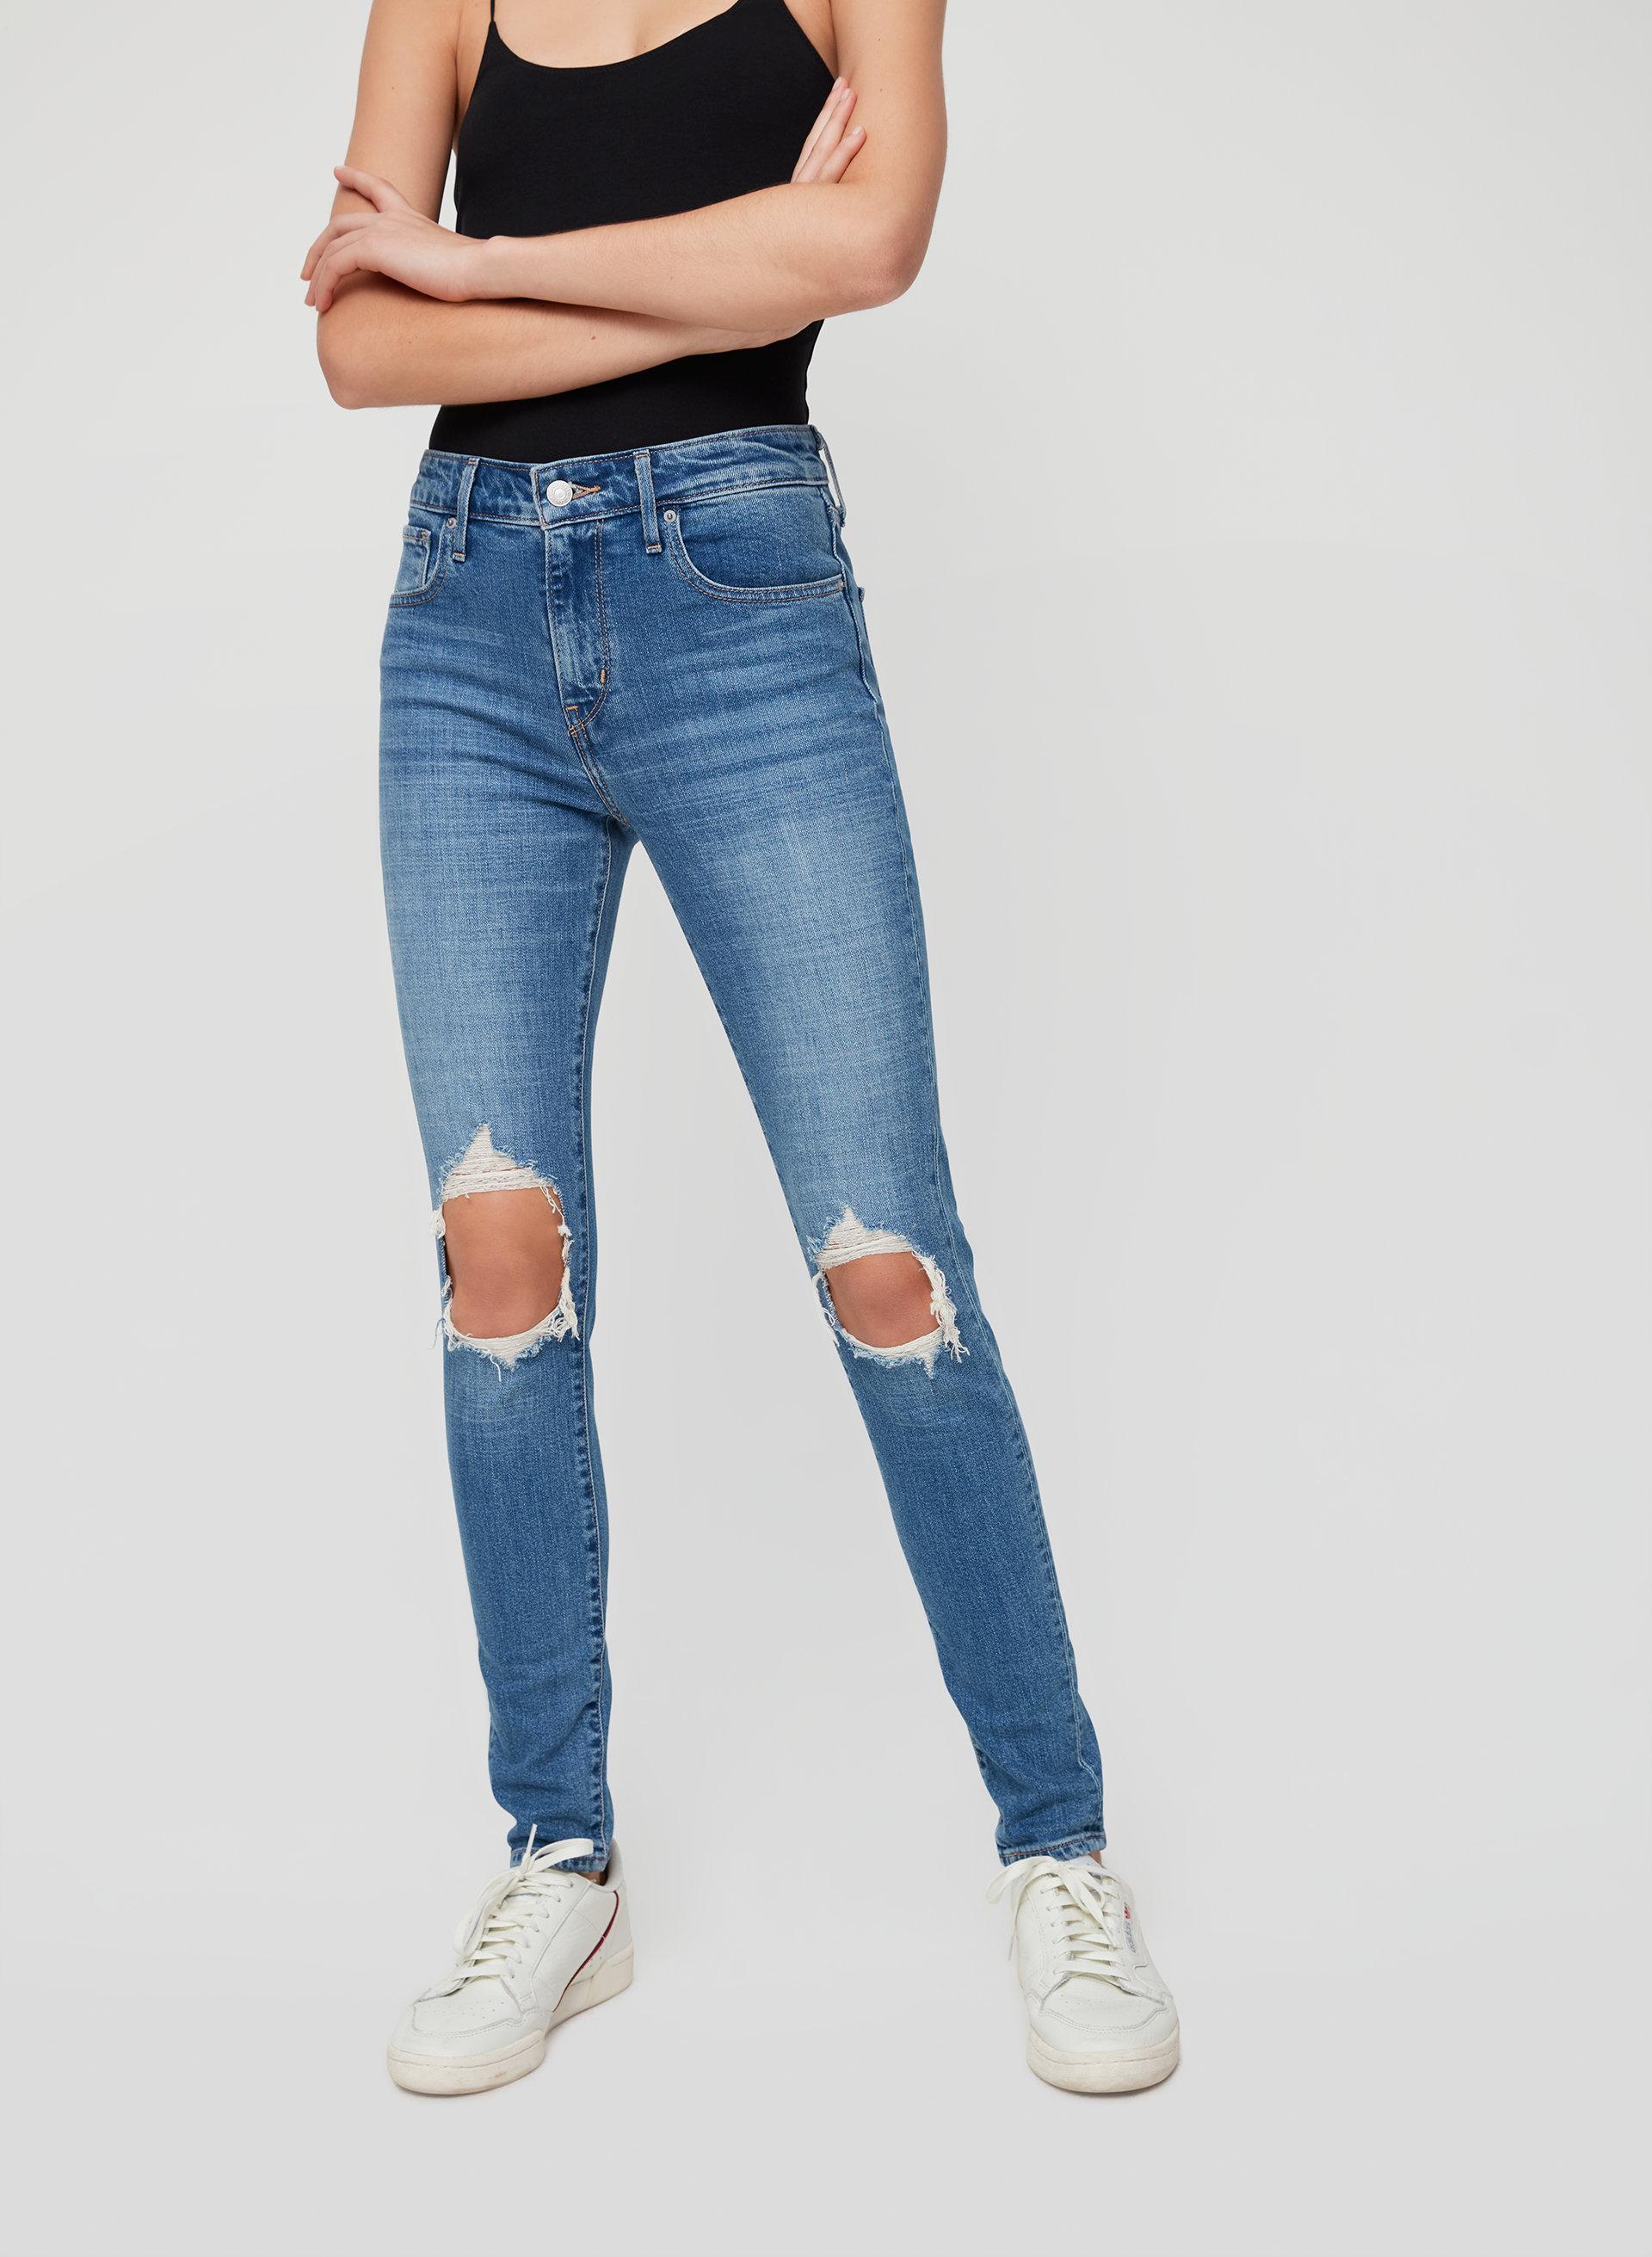 f687f8a84f79 721 skinny High-waisted, ripped skinny jean